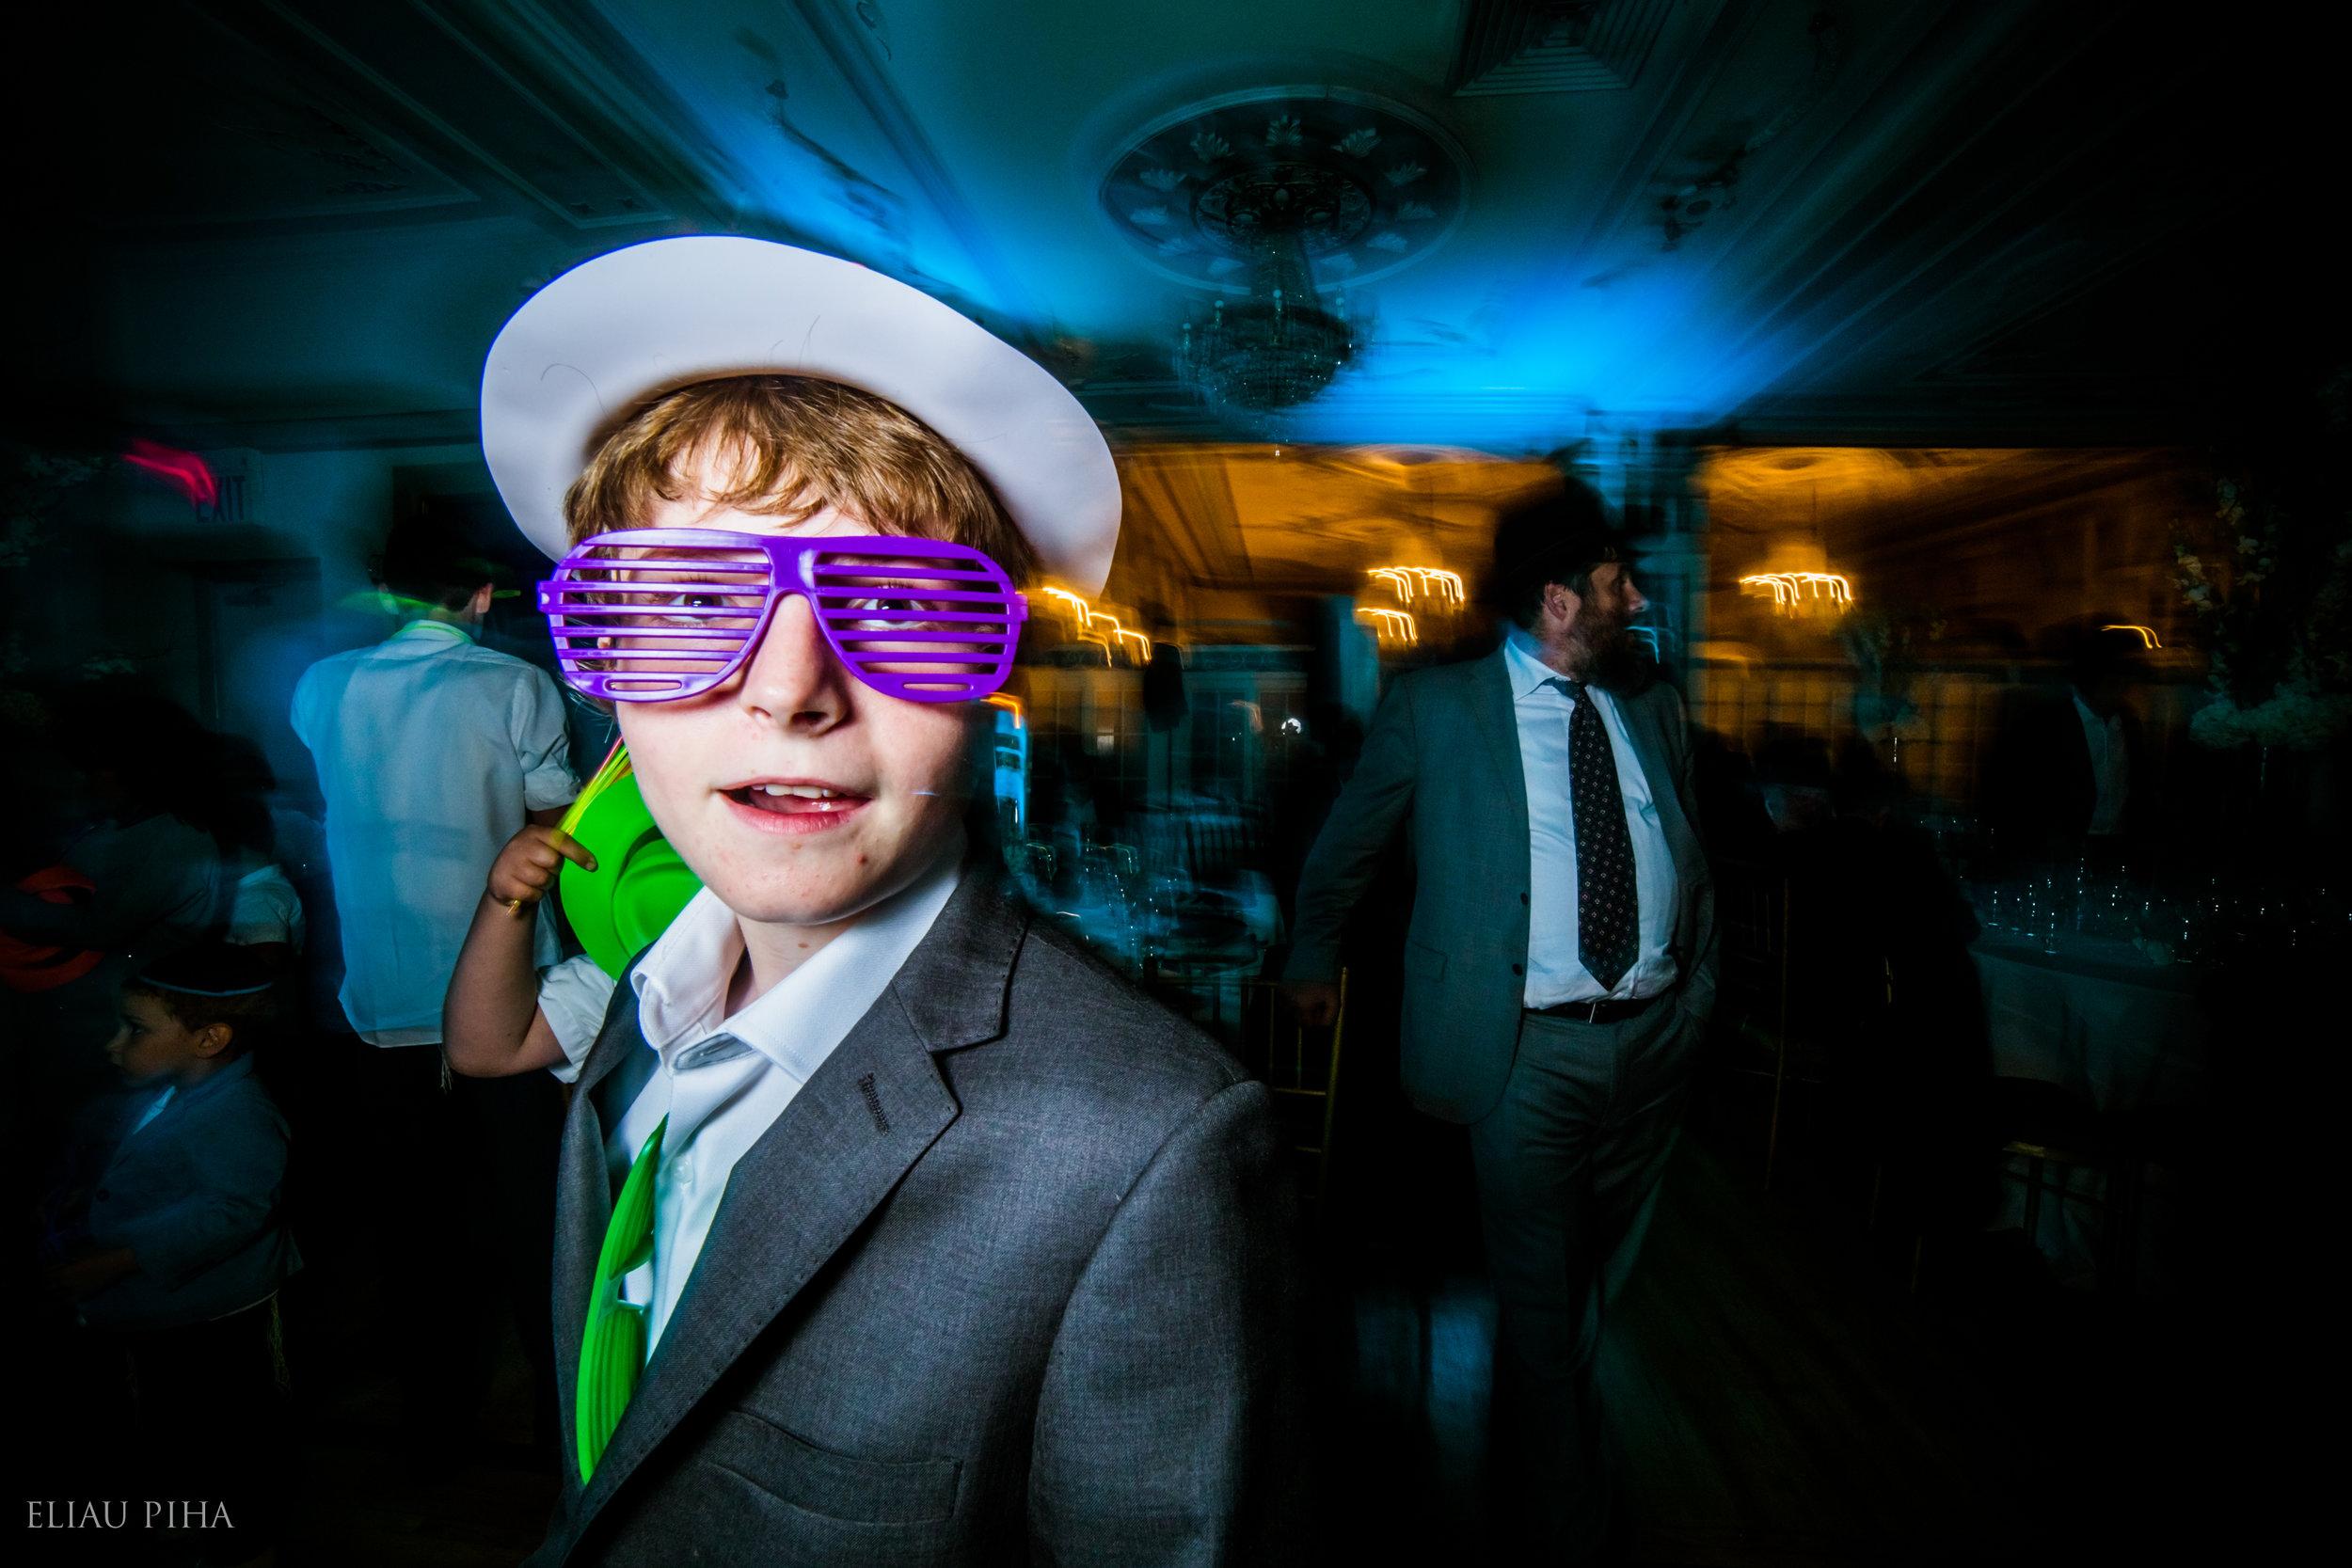 Bar Mitzvah Meir Sandman - photography, new york, events, people -0492.jpg